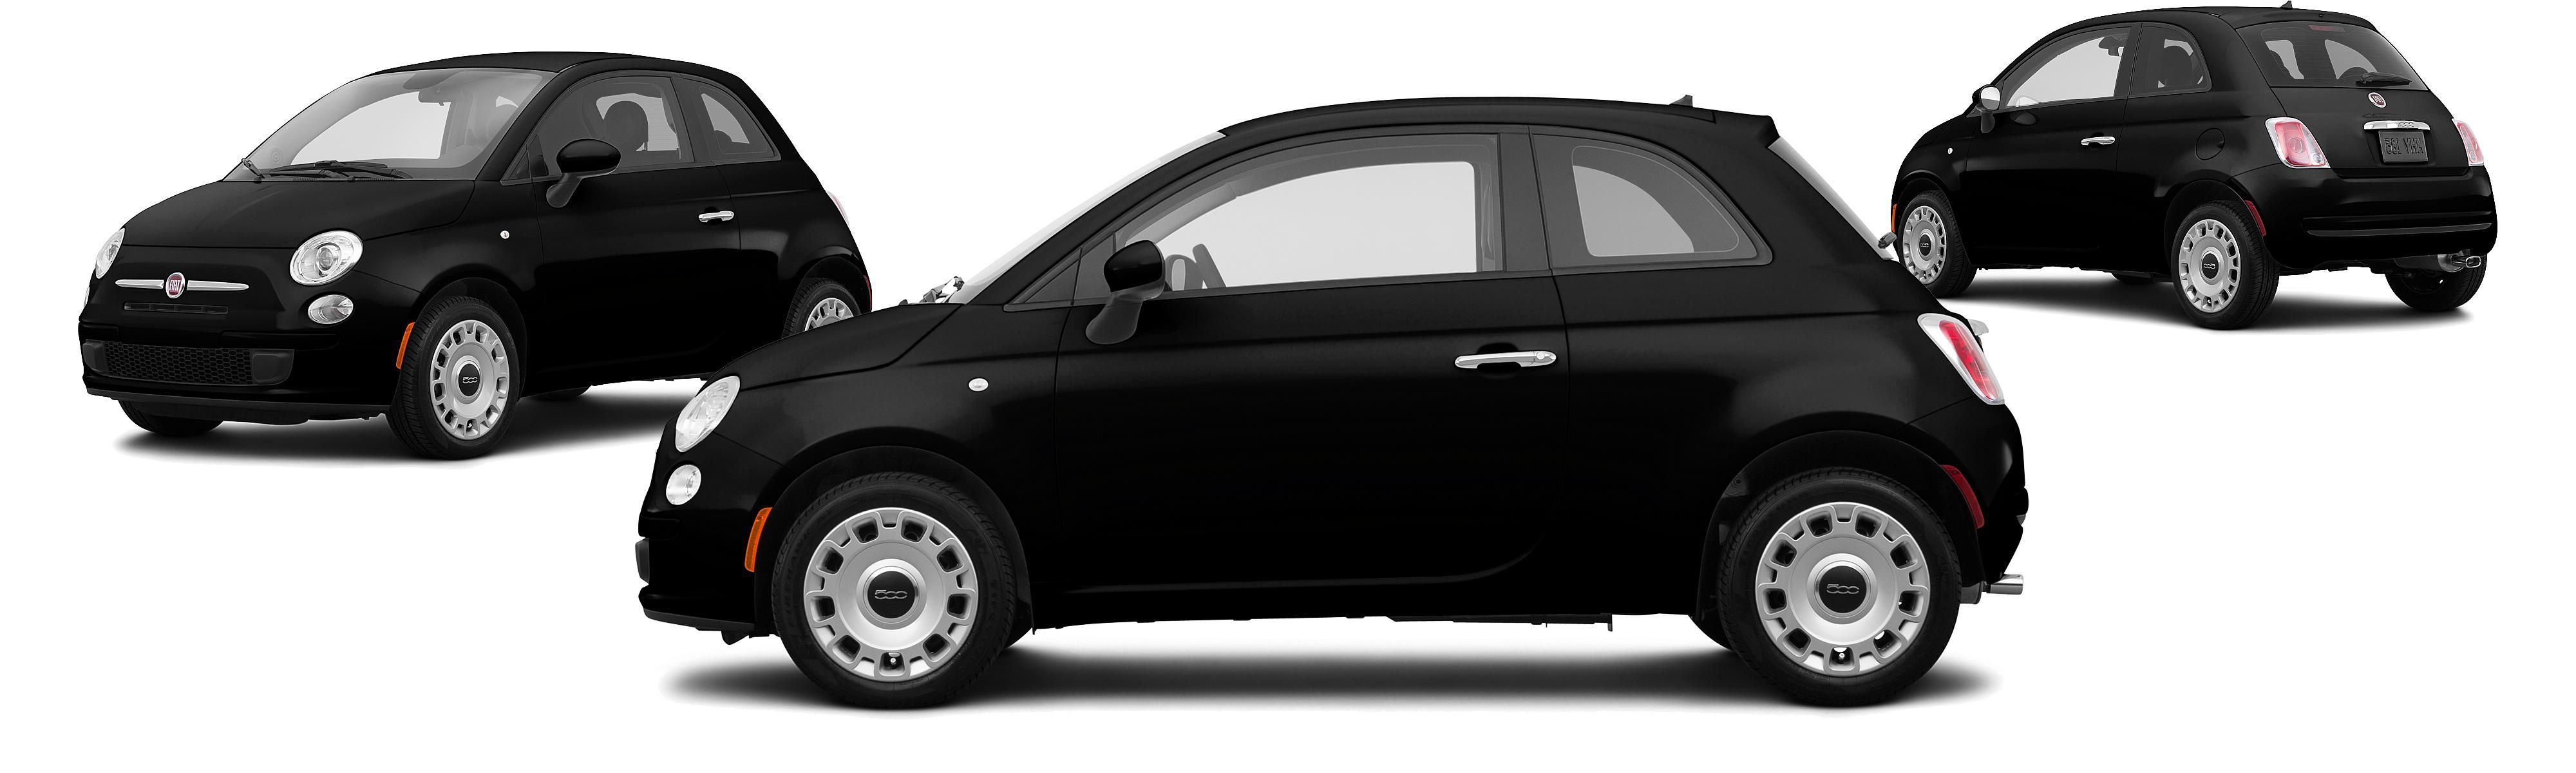 2015 fiat 500 pop 2dr hatchback - research - groovecar